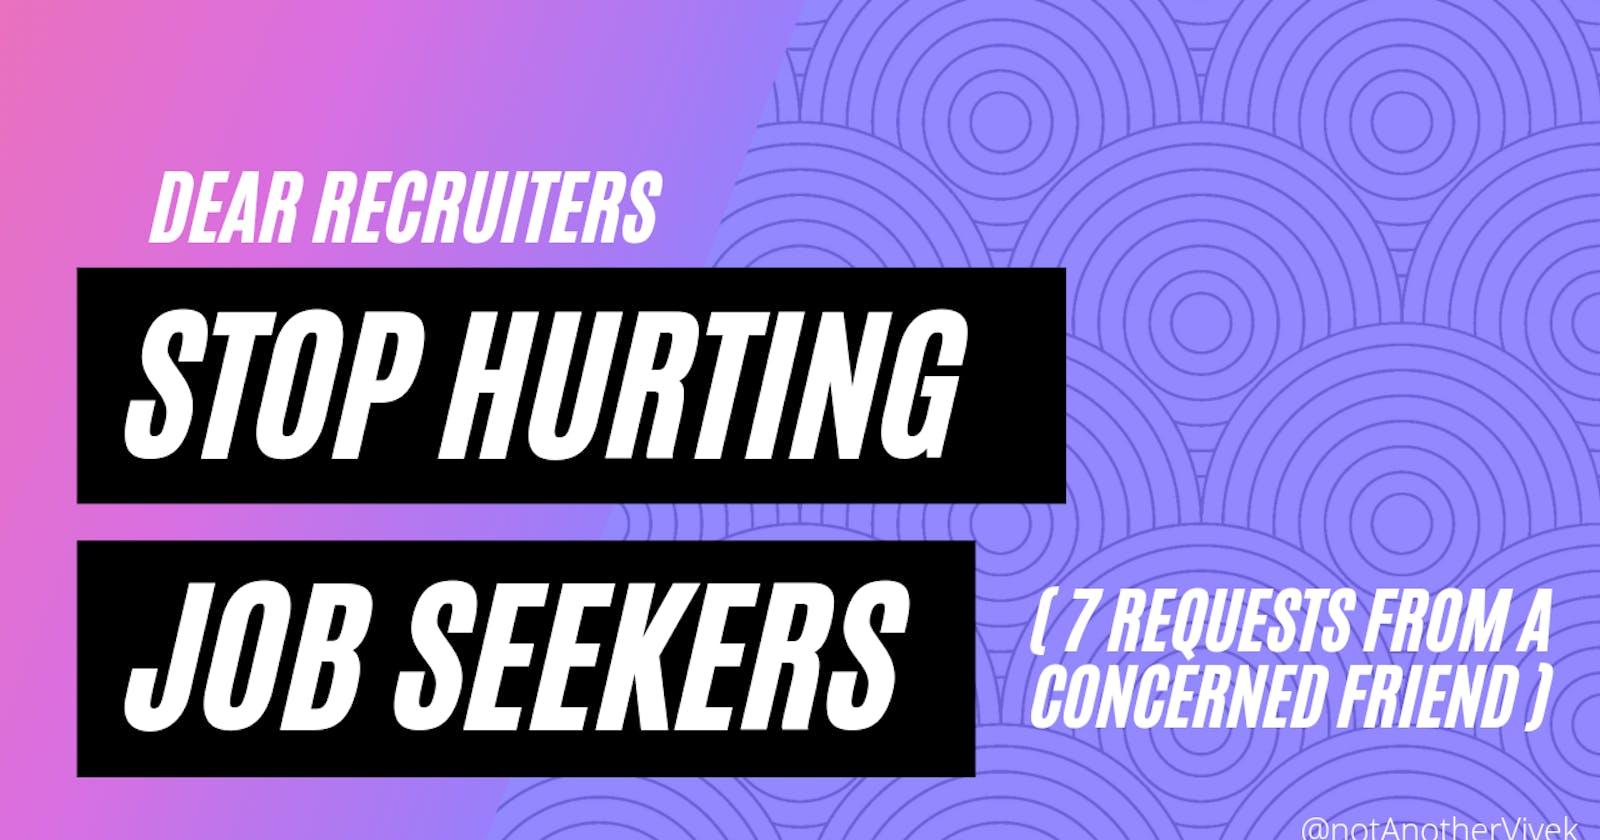 STOP HURTING JOB-SEEKERS , Dear Recruiters